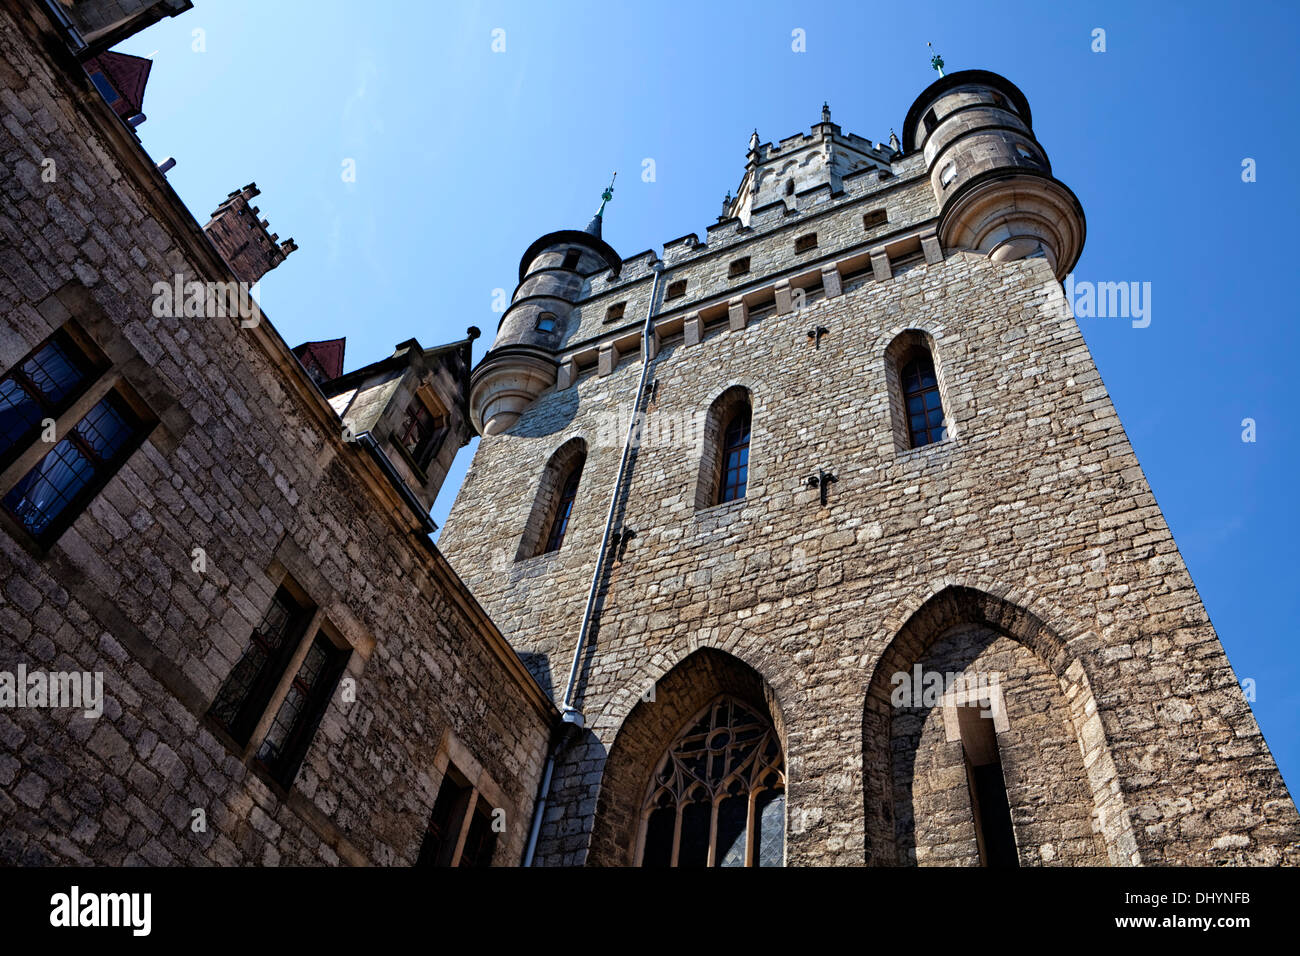 Marienburg Castle, Pattensen near Hannover, Lower Saxony, Germany, Europe, Stock Photo